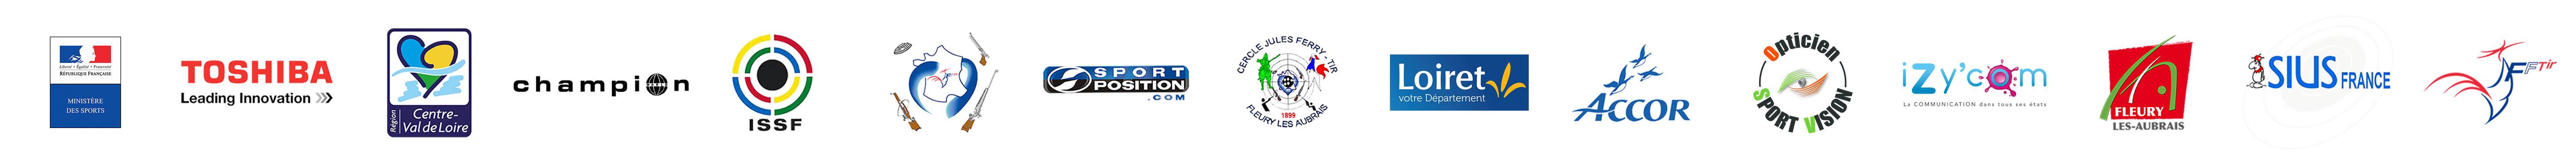 logo GP Fleury 2018 v4.jpg